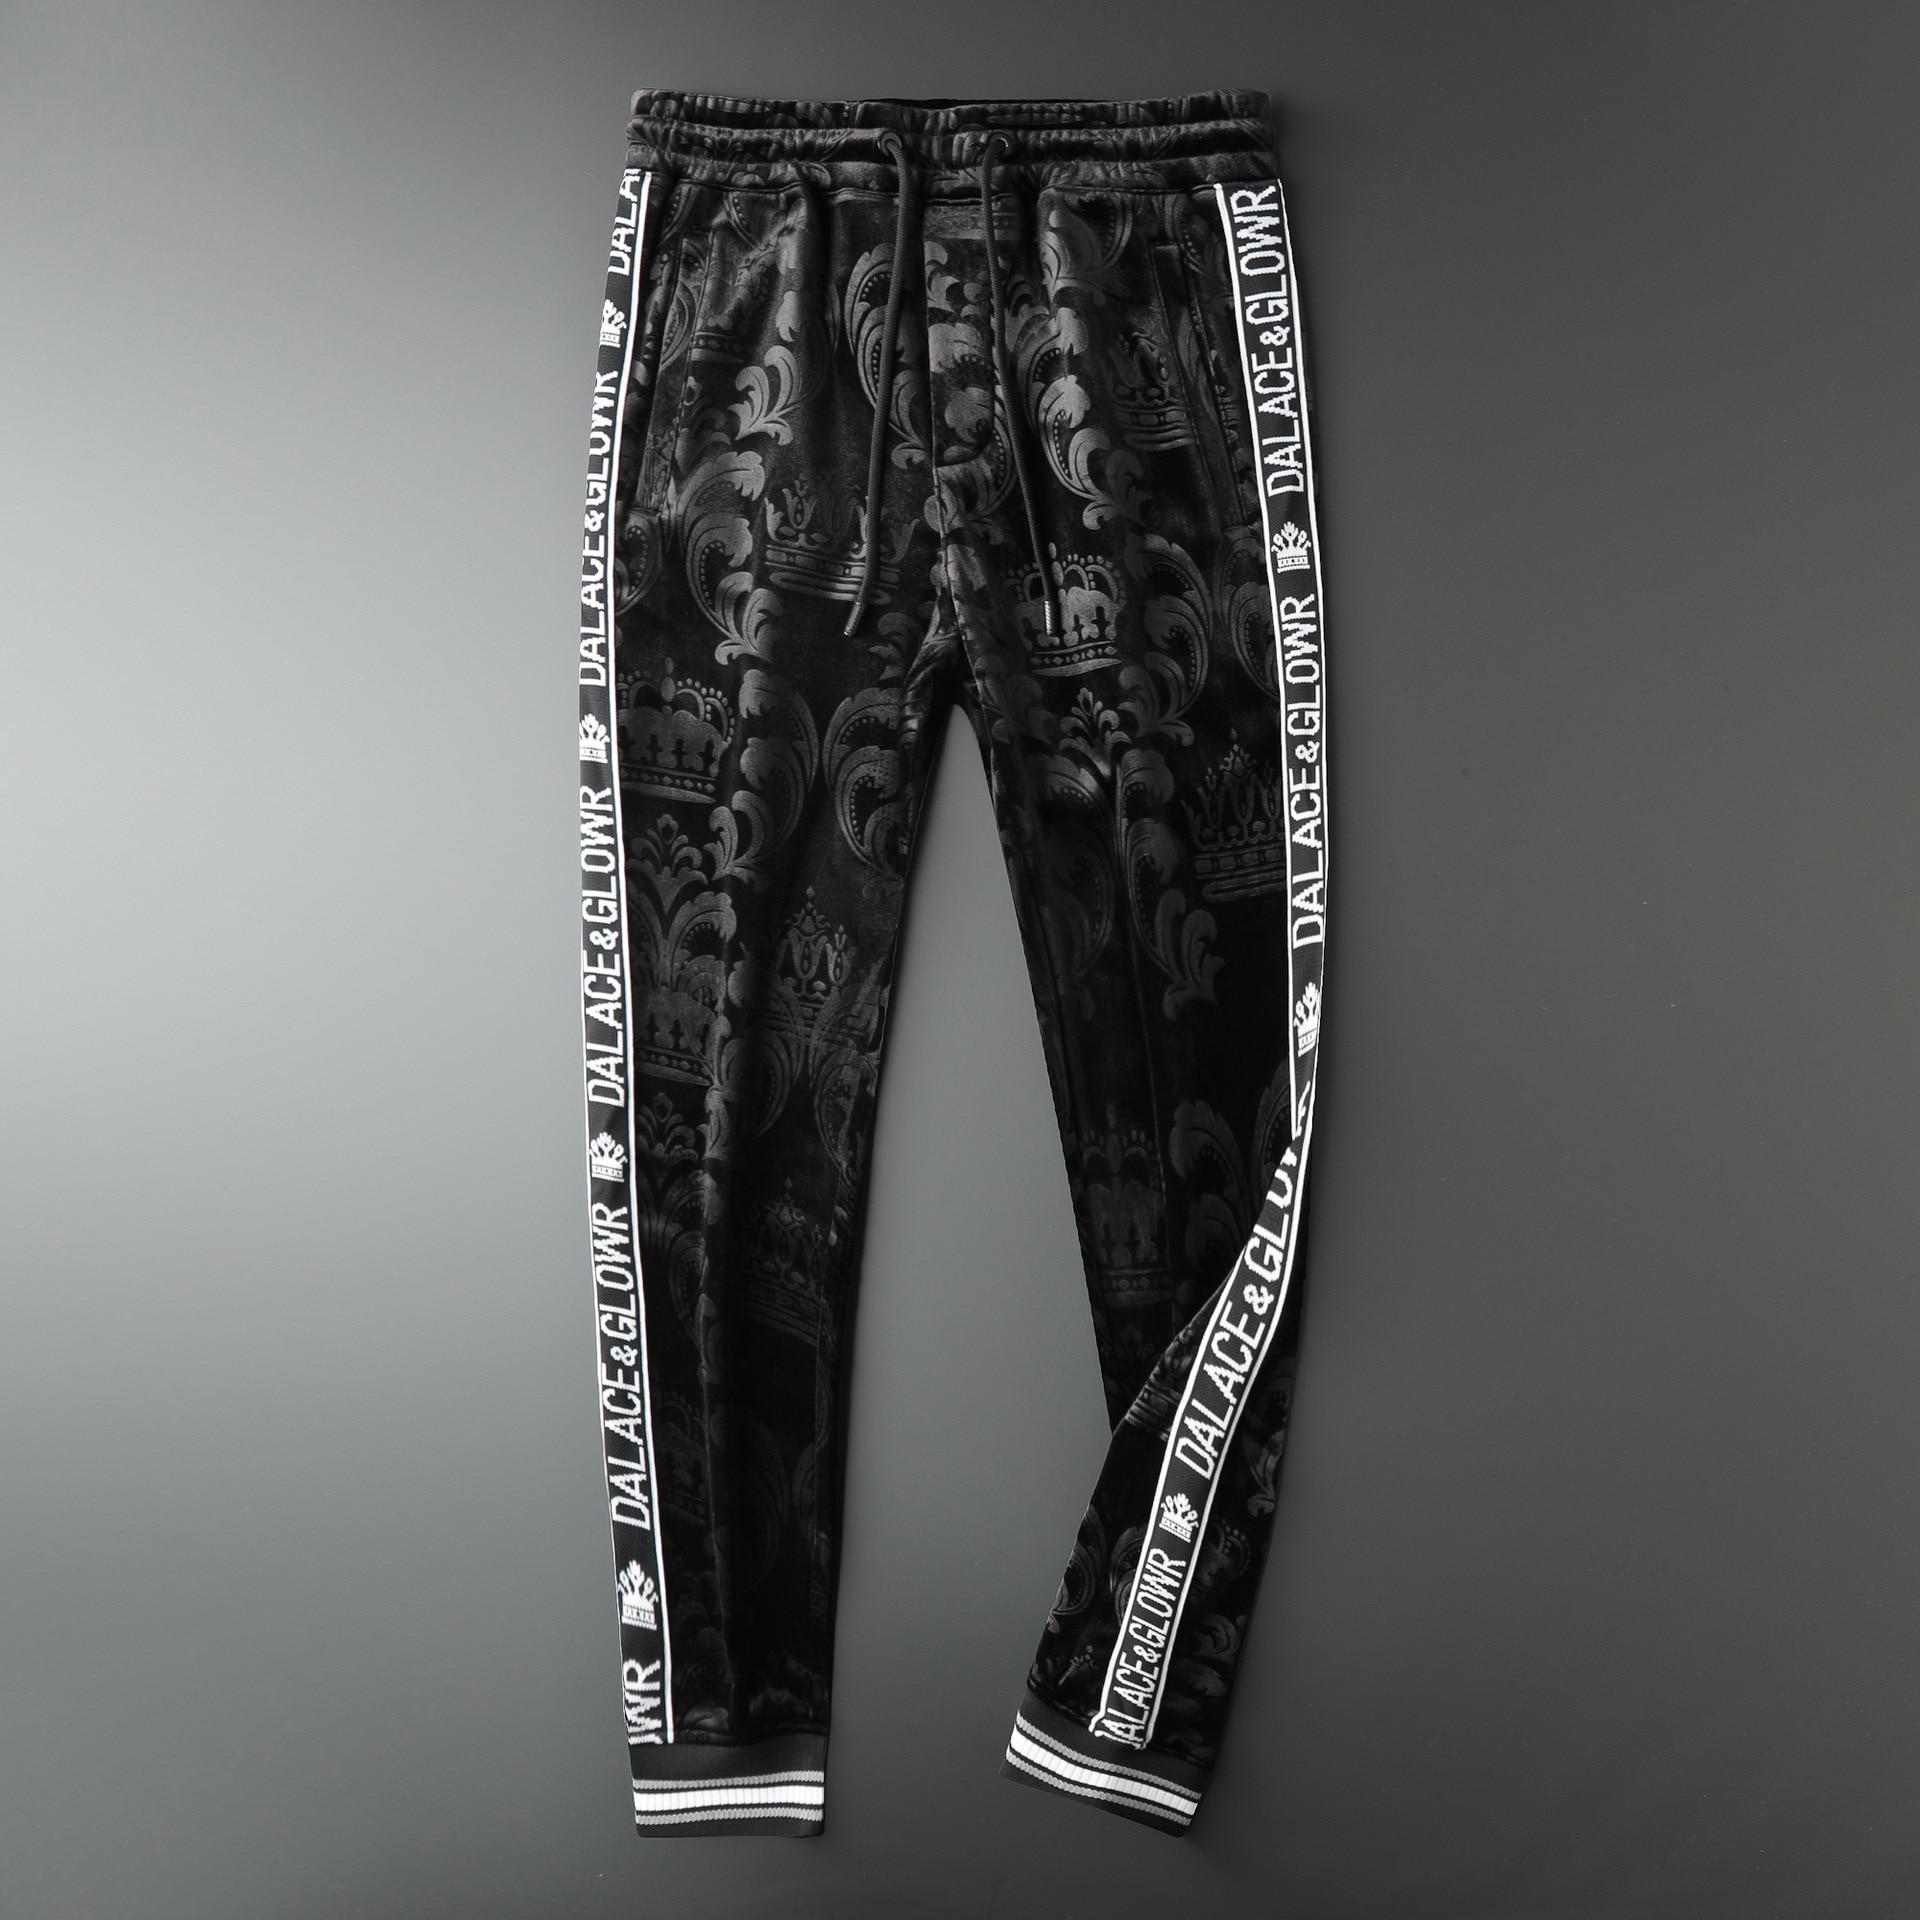 2019 Winter Mens Jogger Pants Crown Printed New Brand Drawstring Sports Pants Black High Fashion Designer Joggers Pantalon Homme